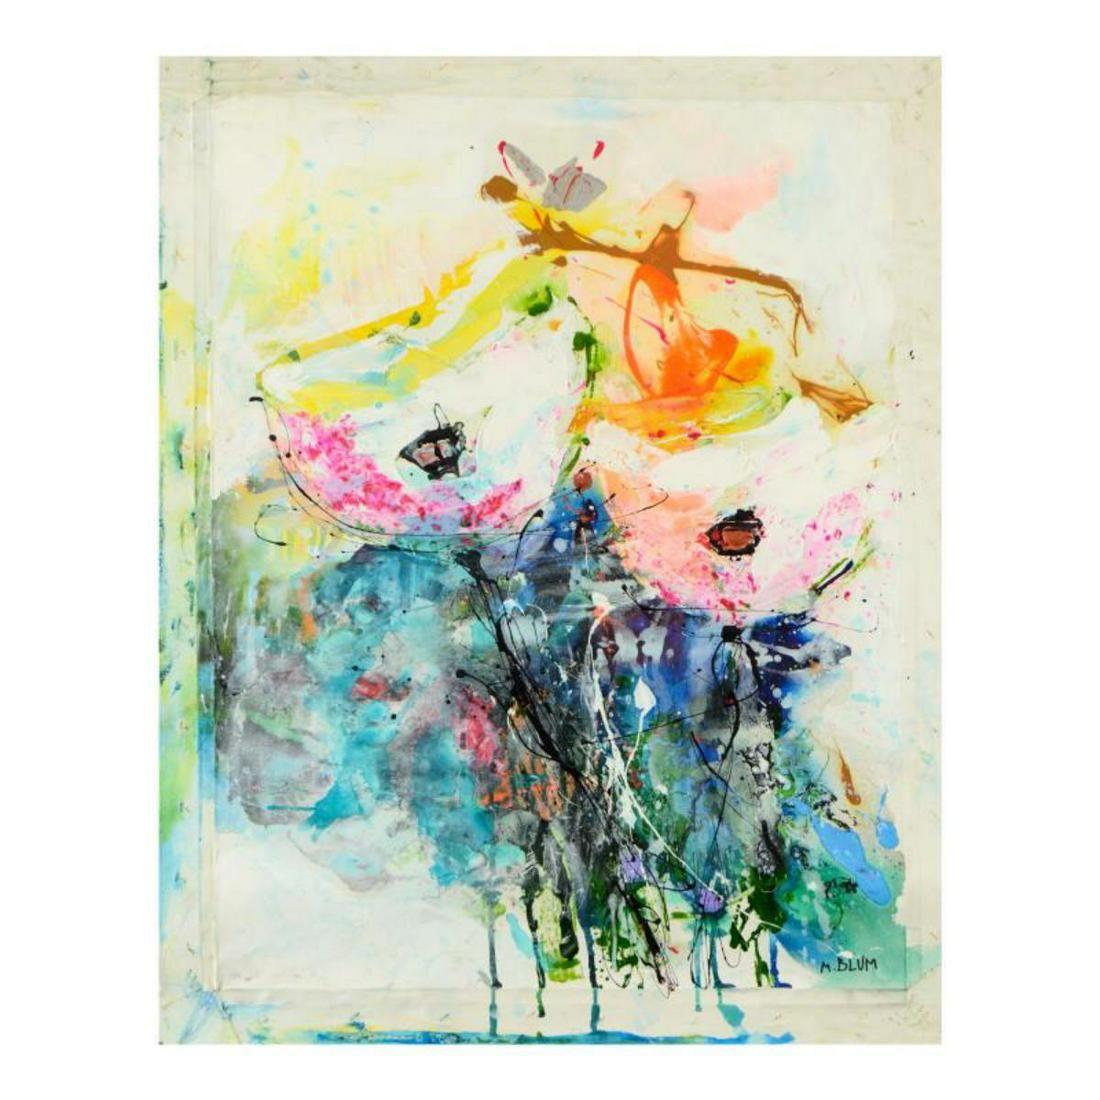 M. Blum, Original Oil Painting on Canvas, Hand Signed